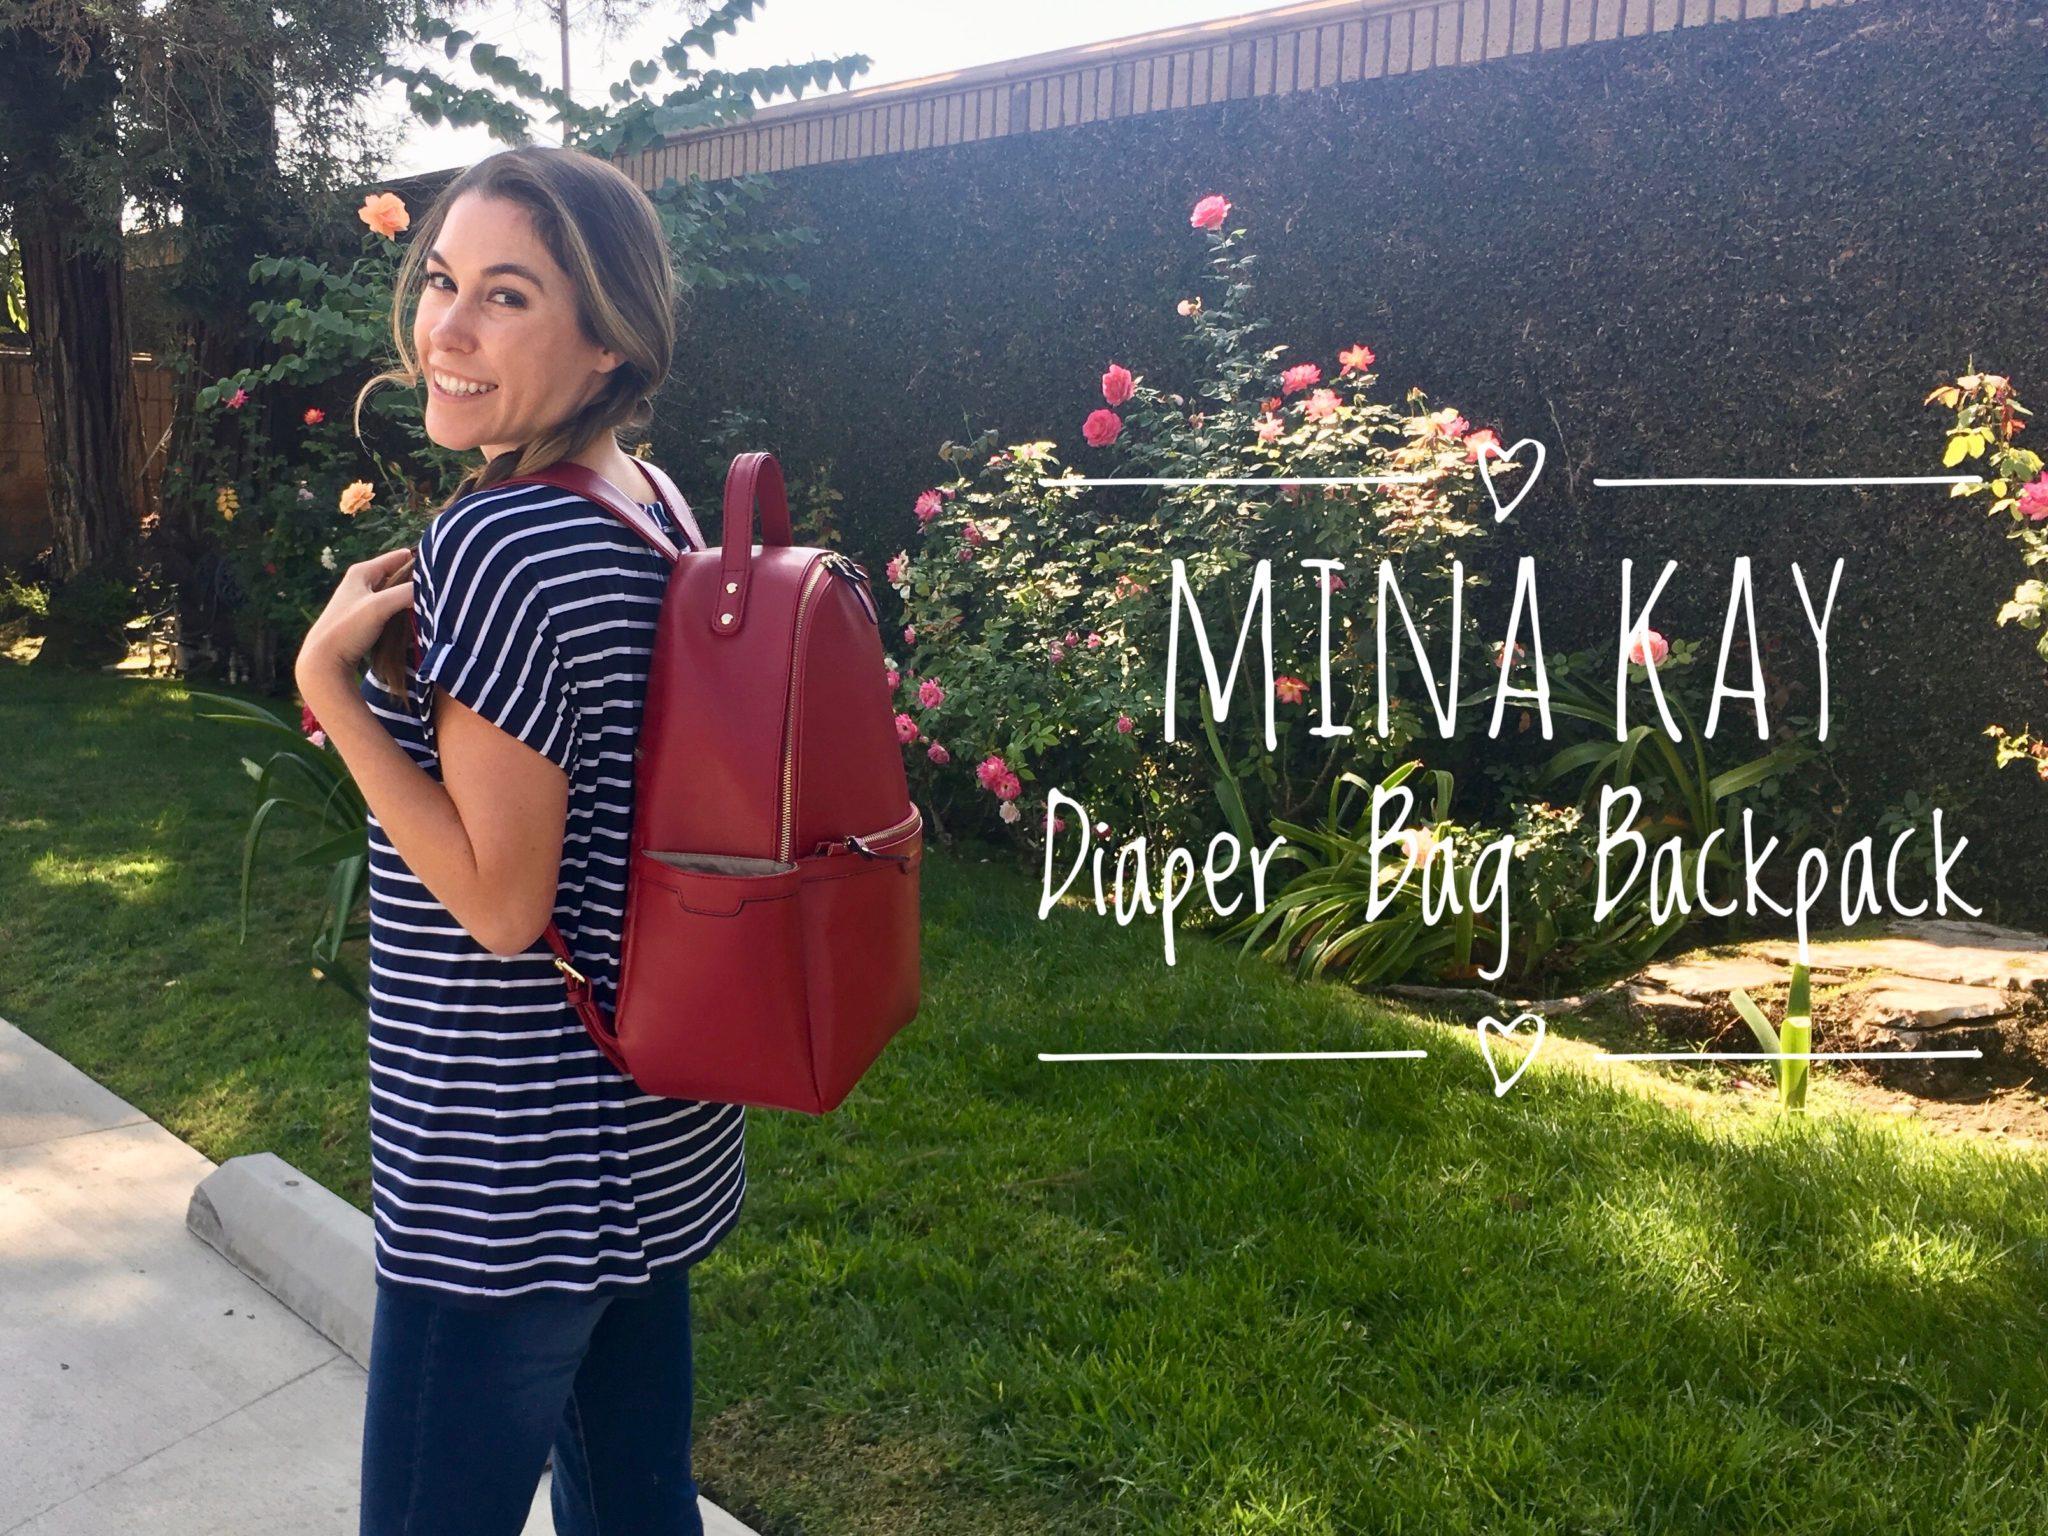 Mina Kay Diaper Bag Backpack